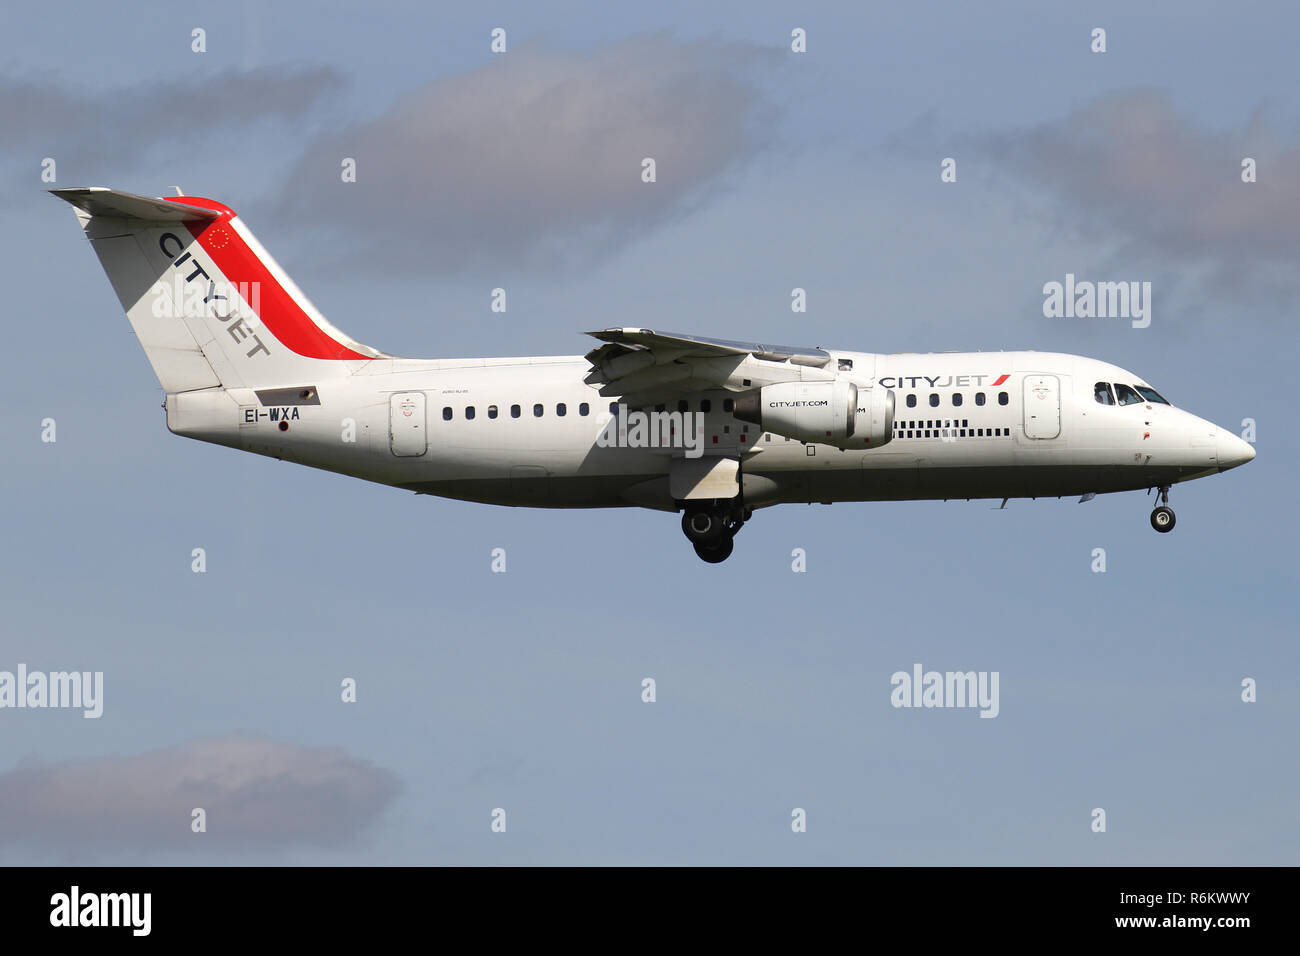 Irish CityJet Avro RJ85 with registration EI-WXA on short final for runway 06 of Amsterdam Airport Schiphol. - Stock Image